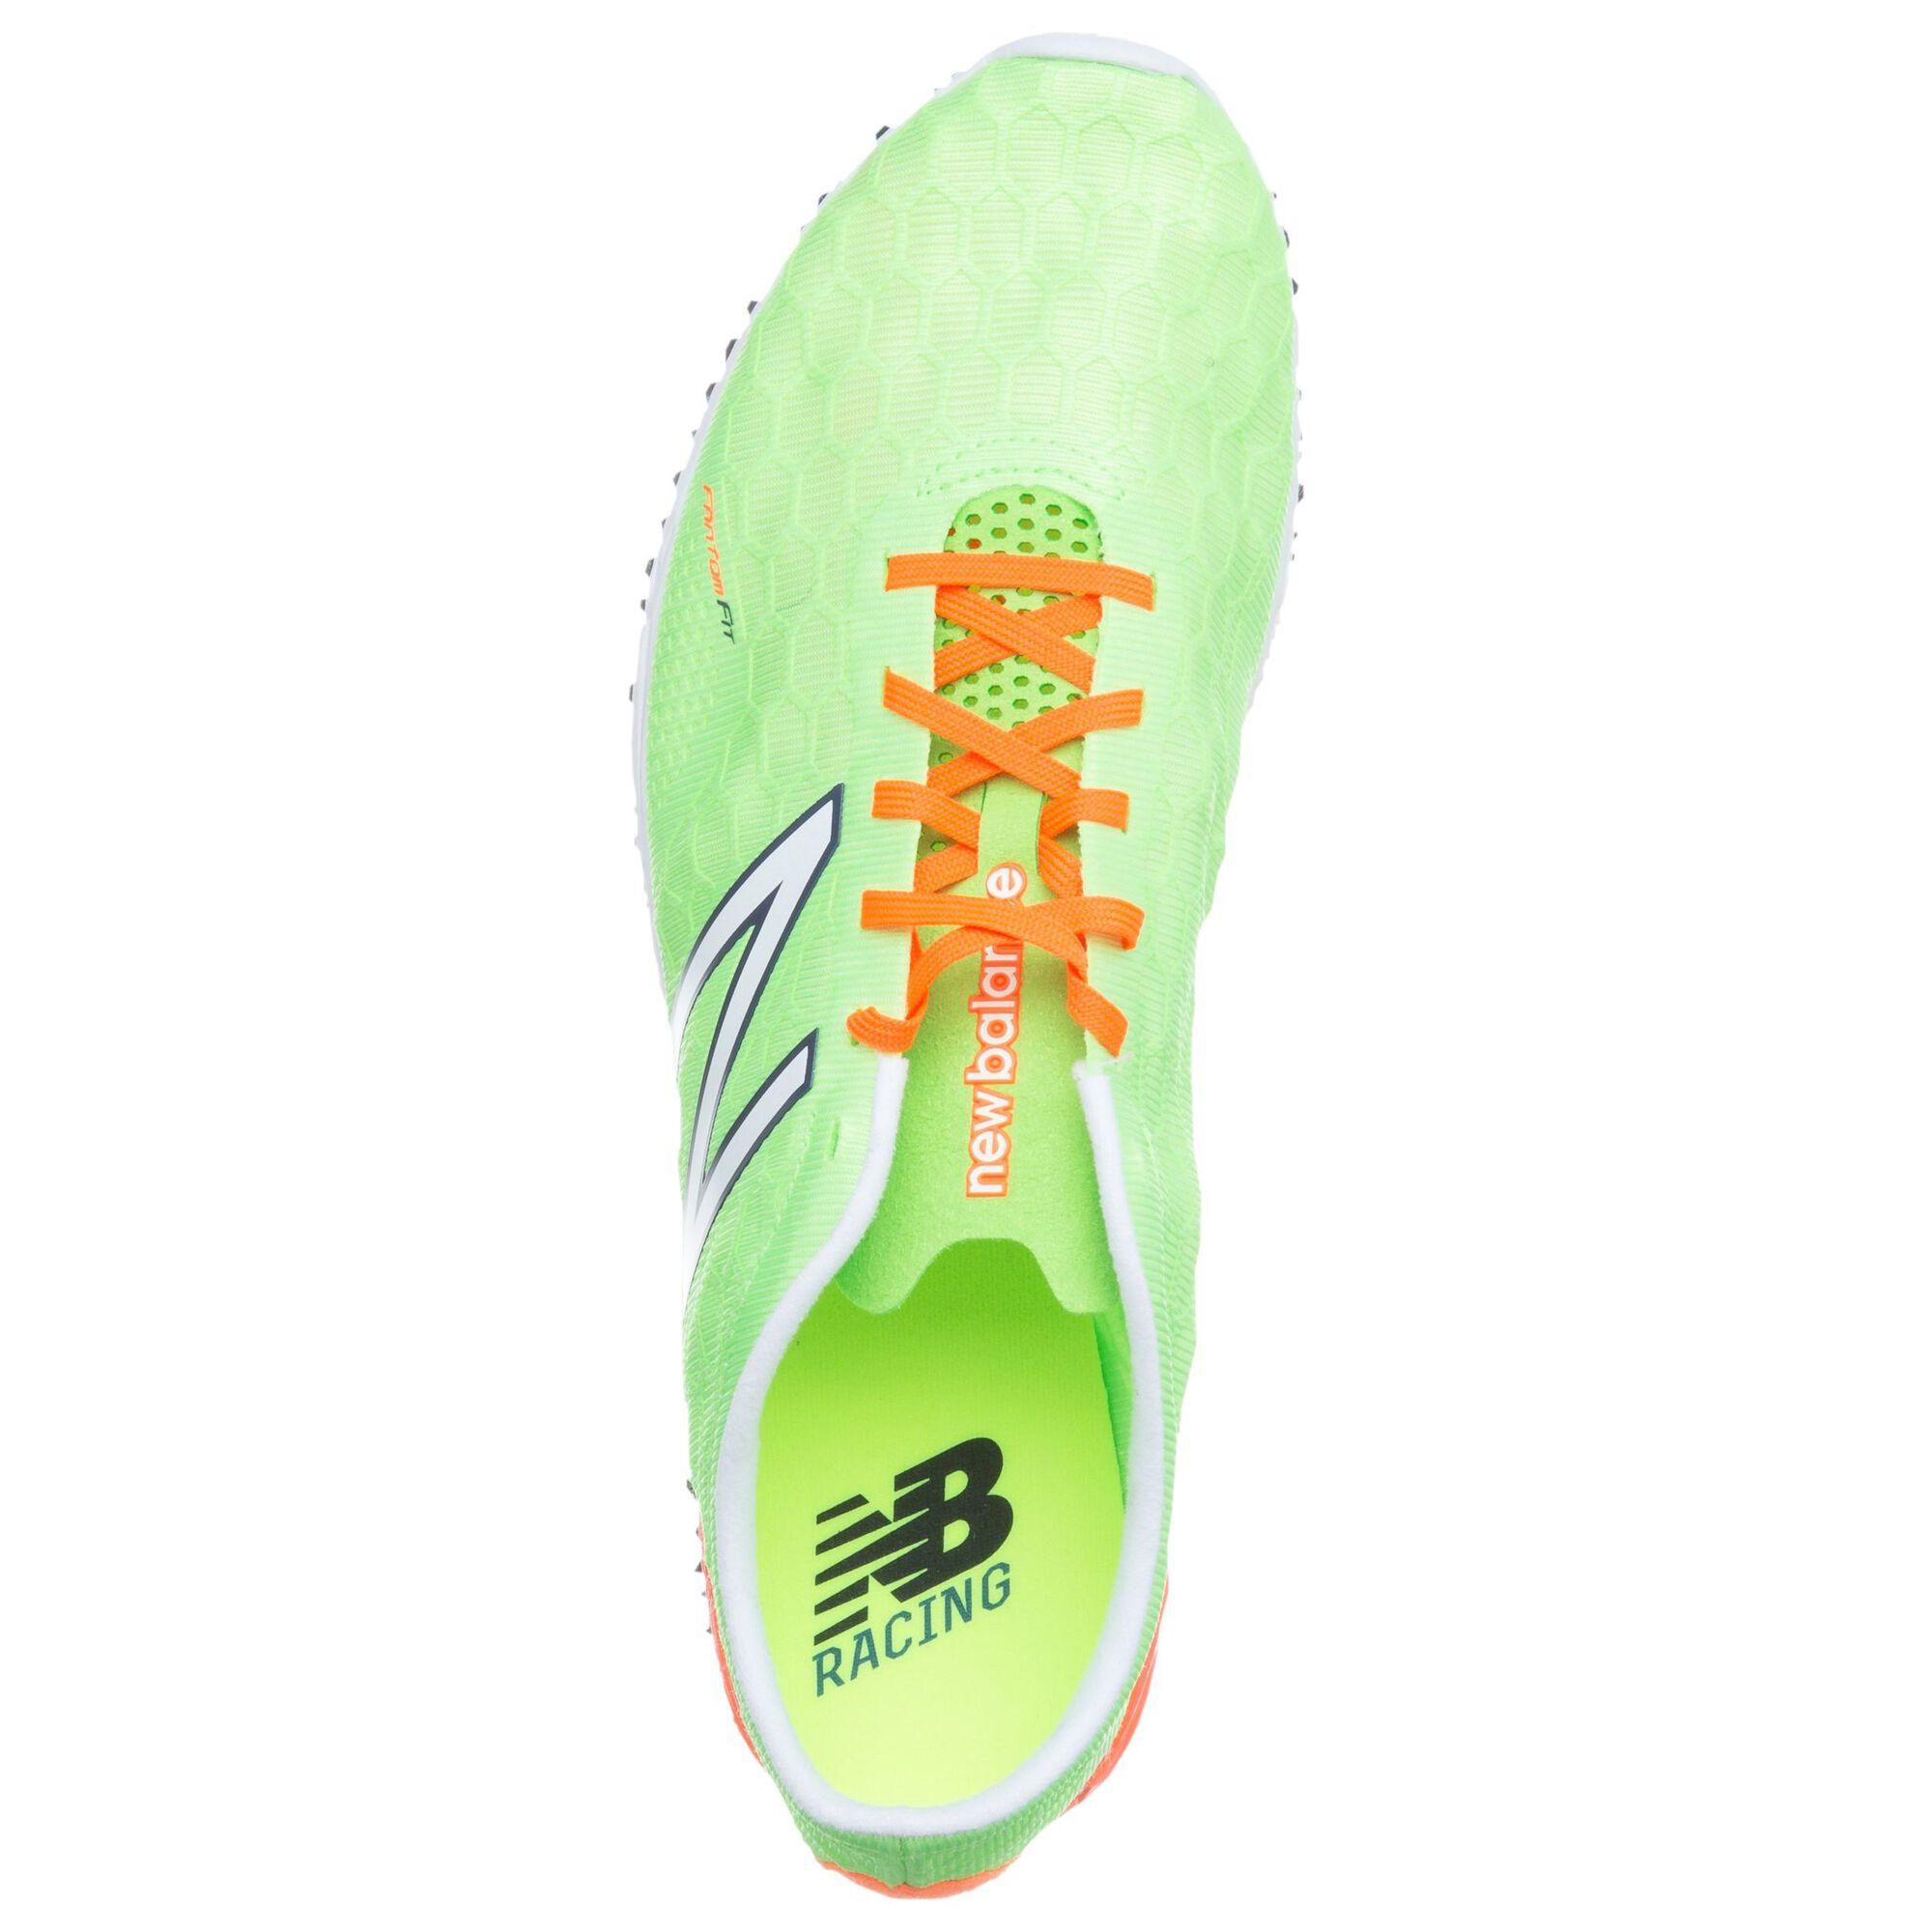 esfuerzo Petición Discriminación sexual  buy New Balance MRC 5000 D Competition Running Shoe Men - Neon Green, Coral  online | Jogging-Point